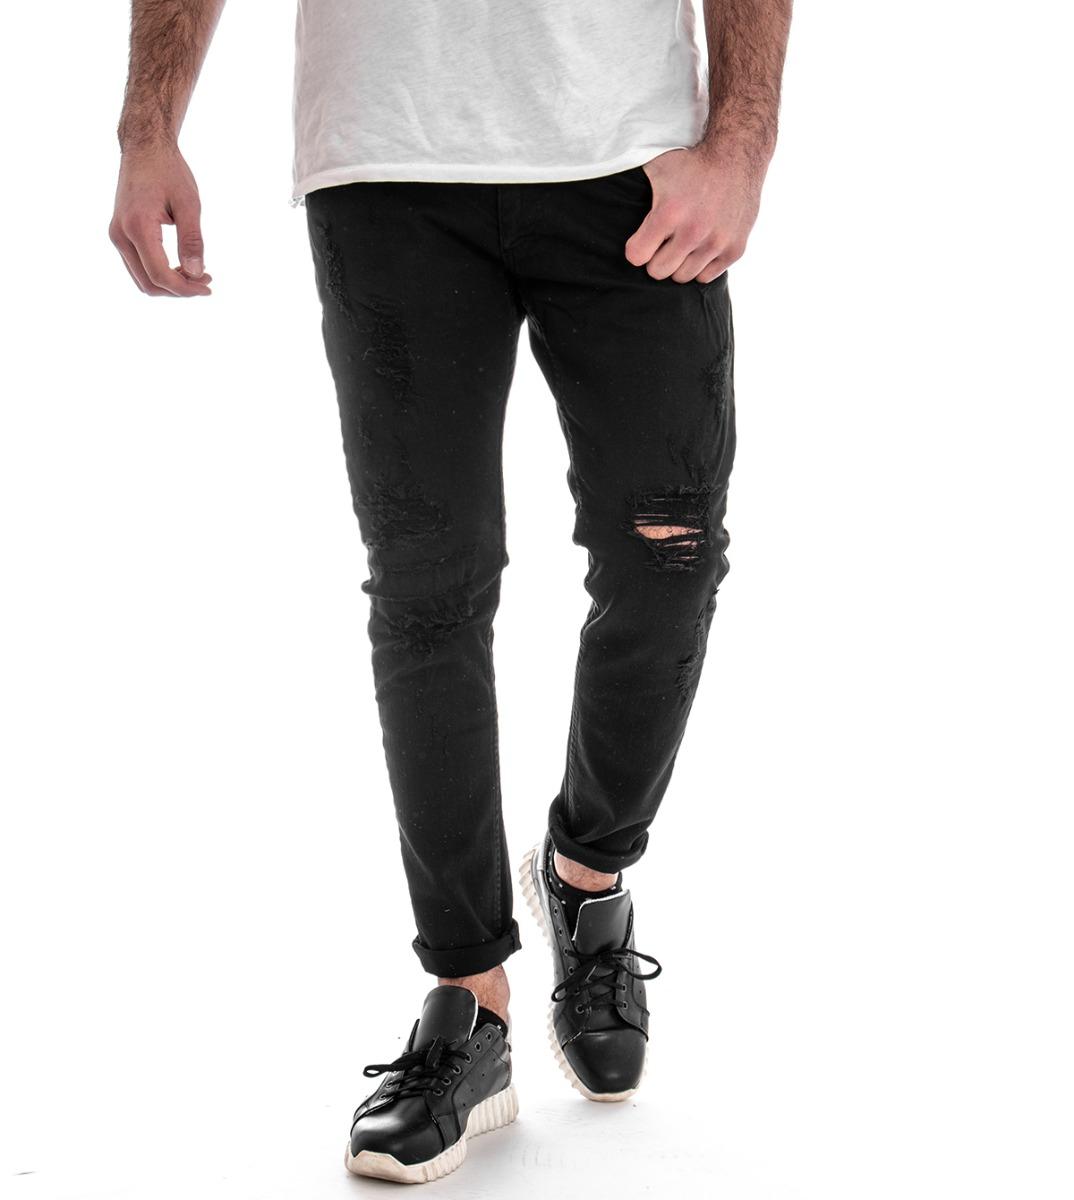 Pantalone men Cinque Tasche redture black Tinta Unita MOD Casual GIOSAL